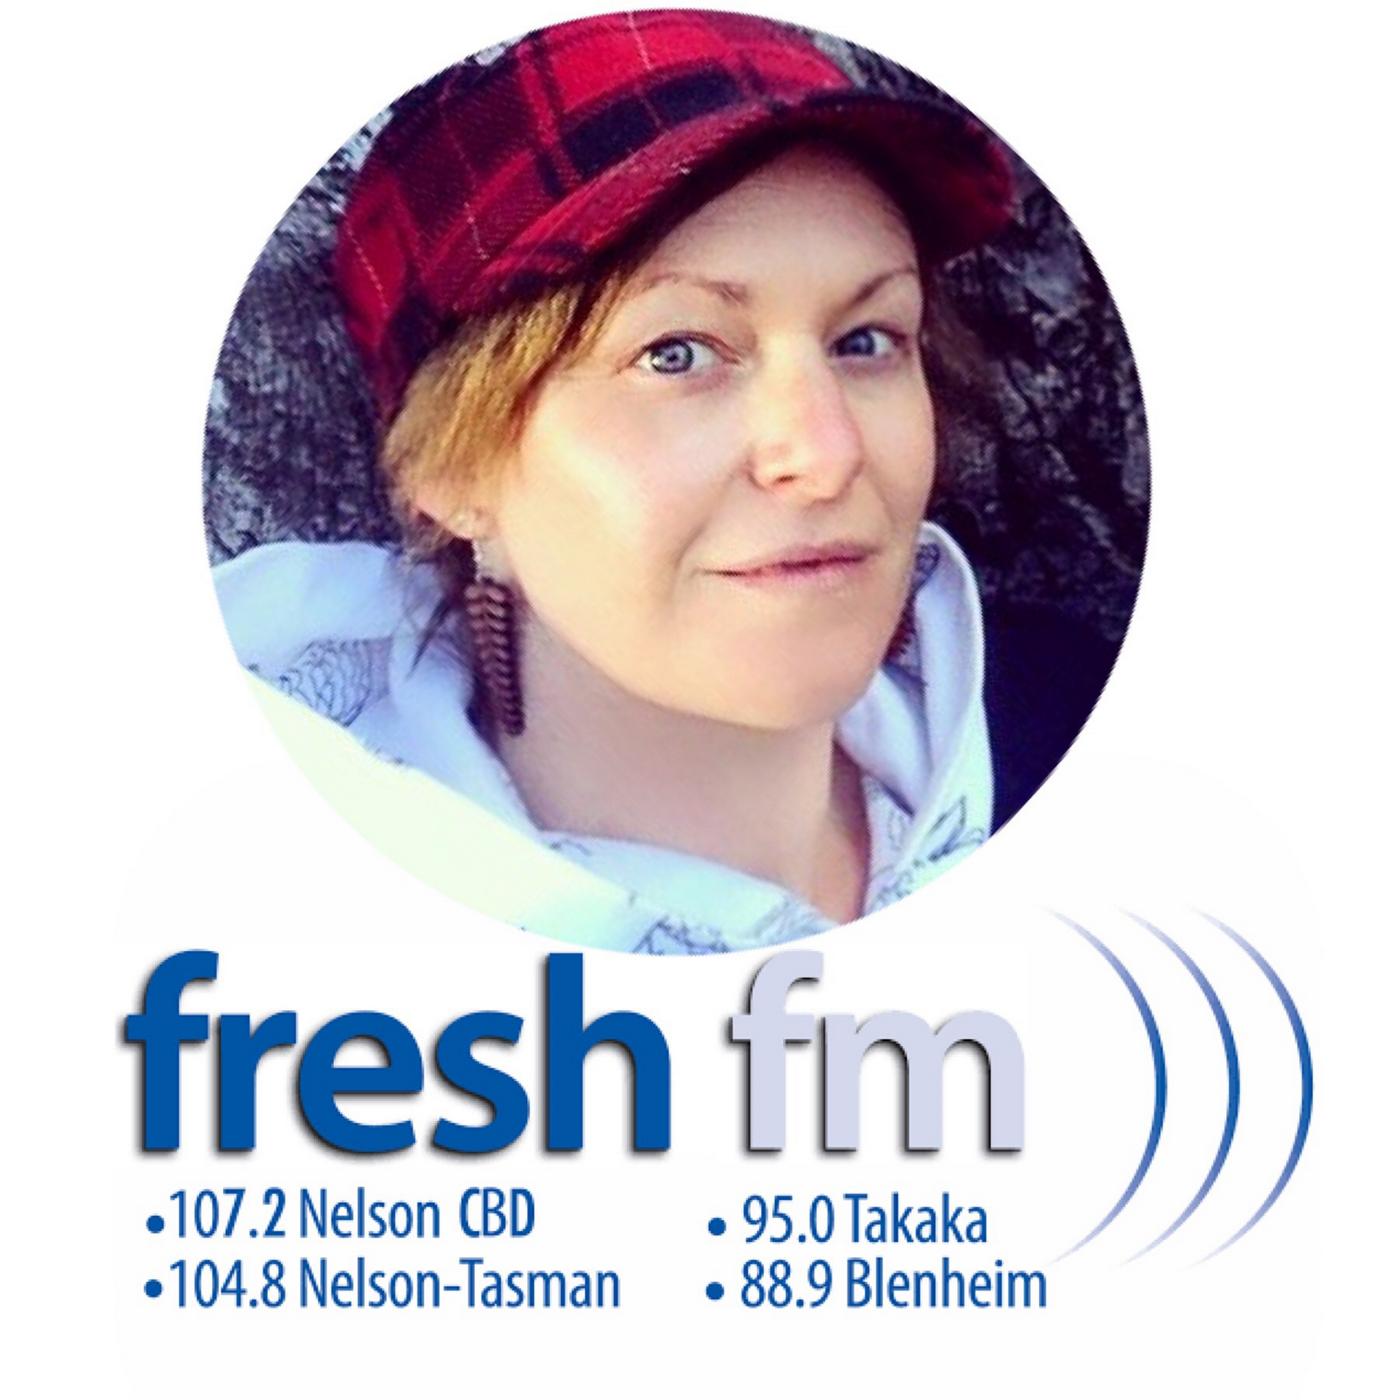 https://cdn.accessradio.org/StationFolder/freshfm/Images/Wendy---Fresh-Start1.png